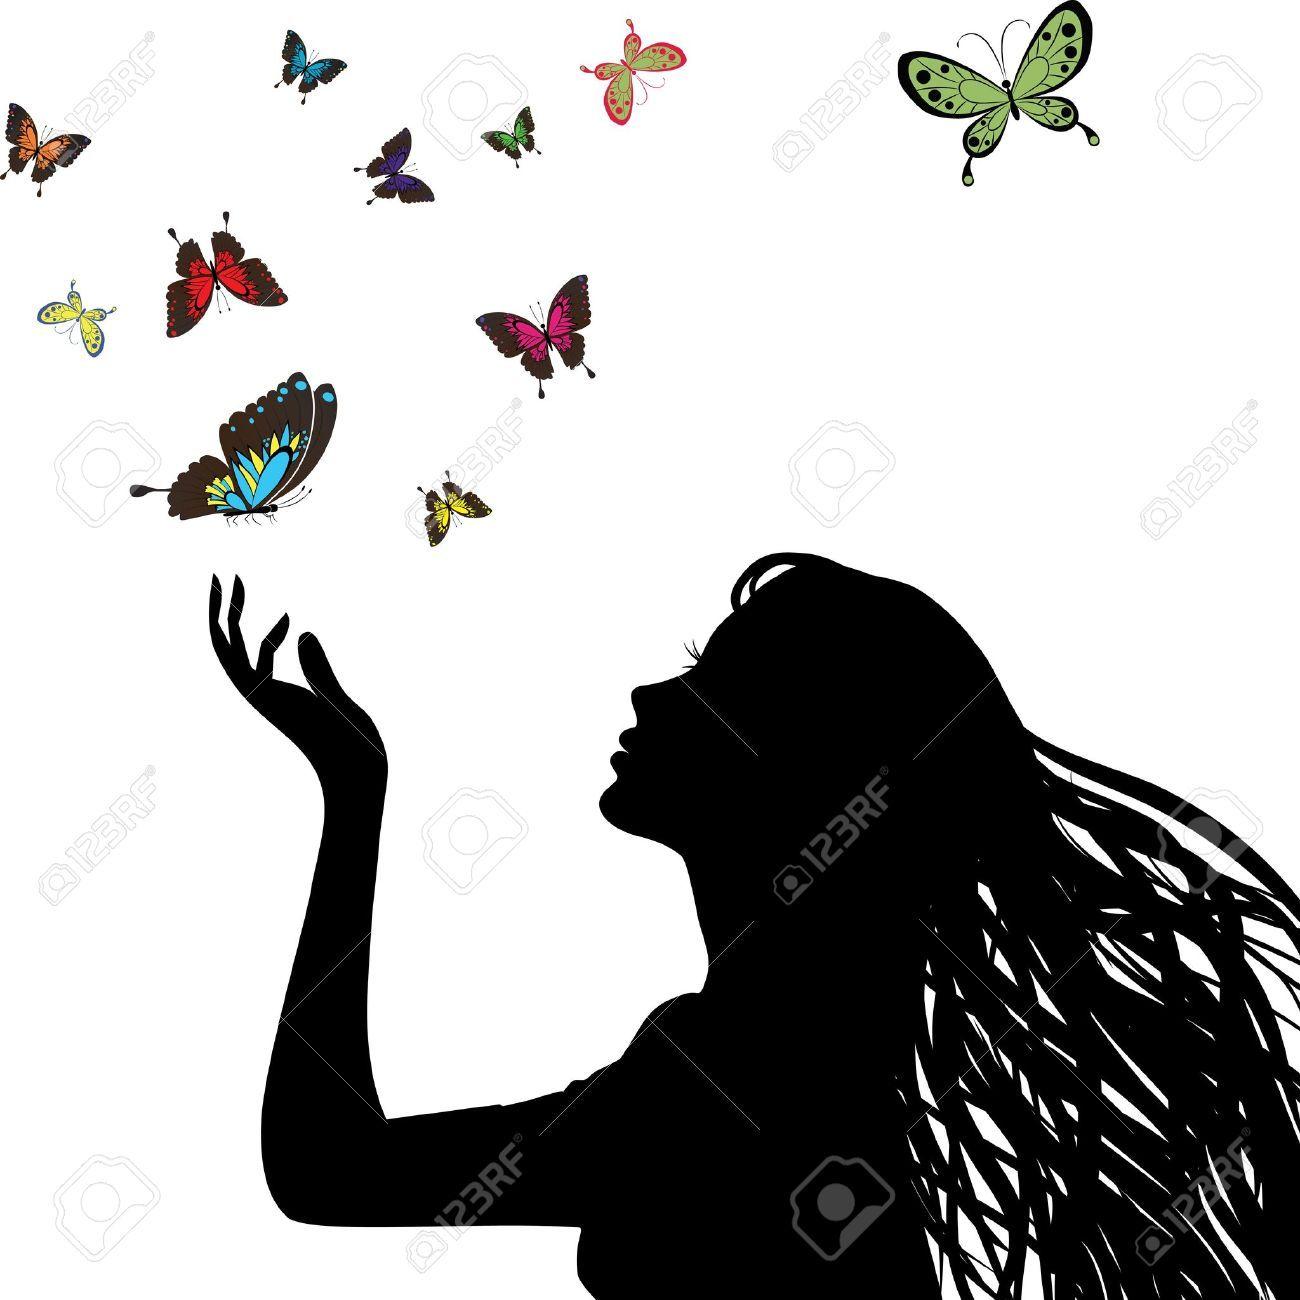 Woman face profile Female head silhouette Vector Image  Face Profile Silhouette Blowing